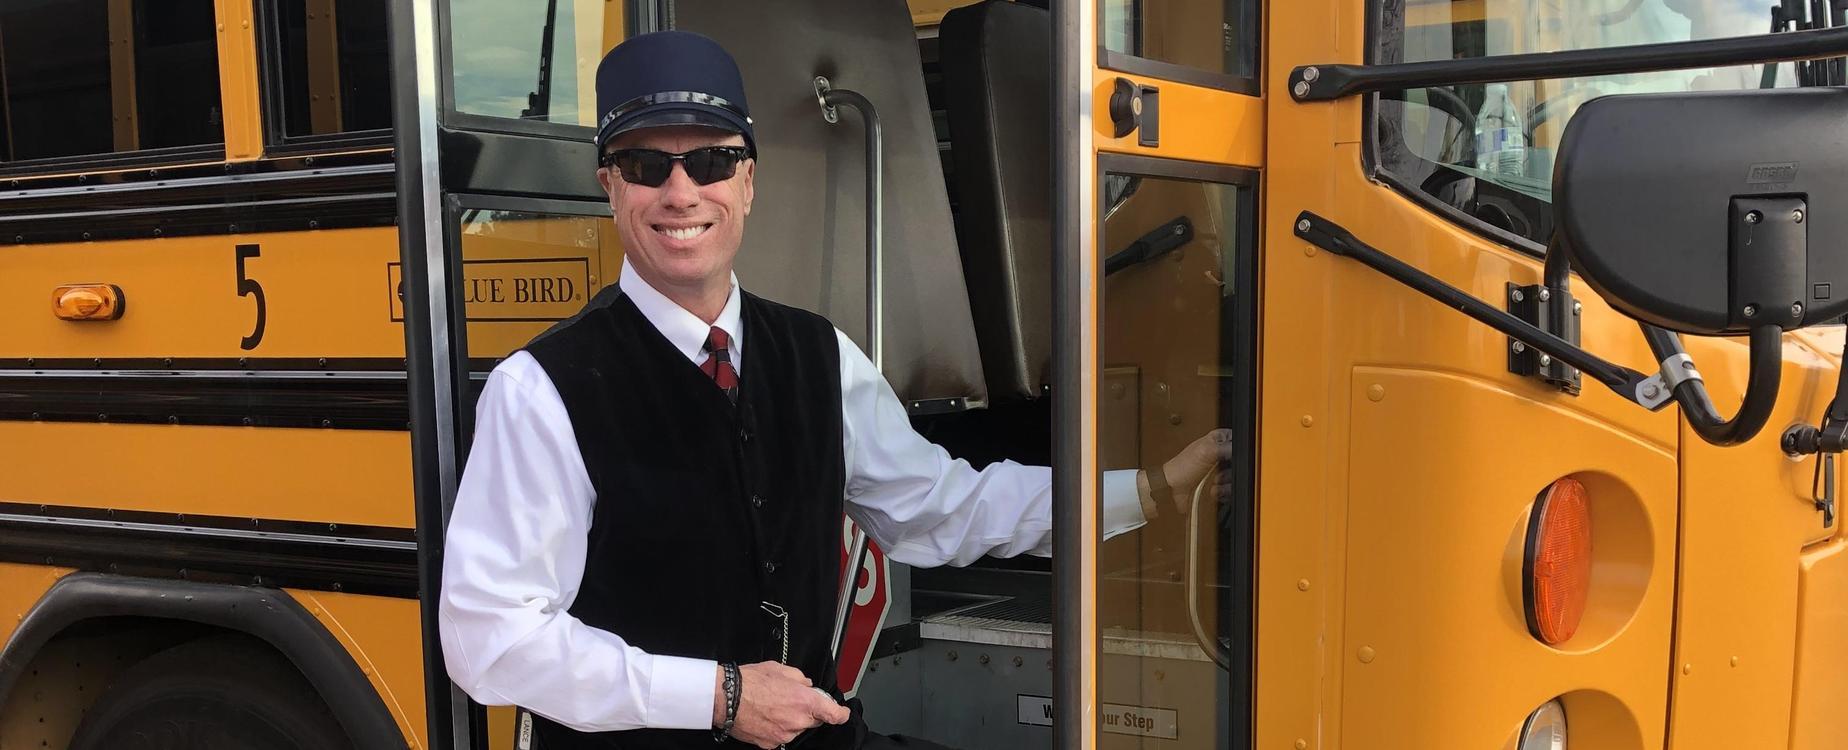 Mr. Lance as Polar Express Conductor